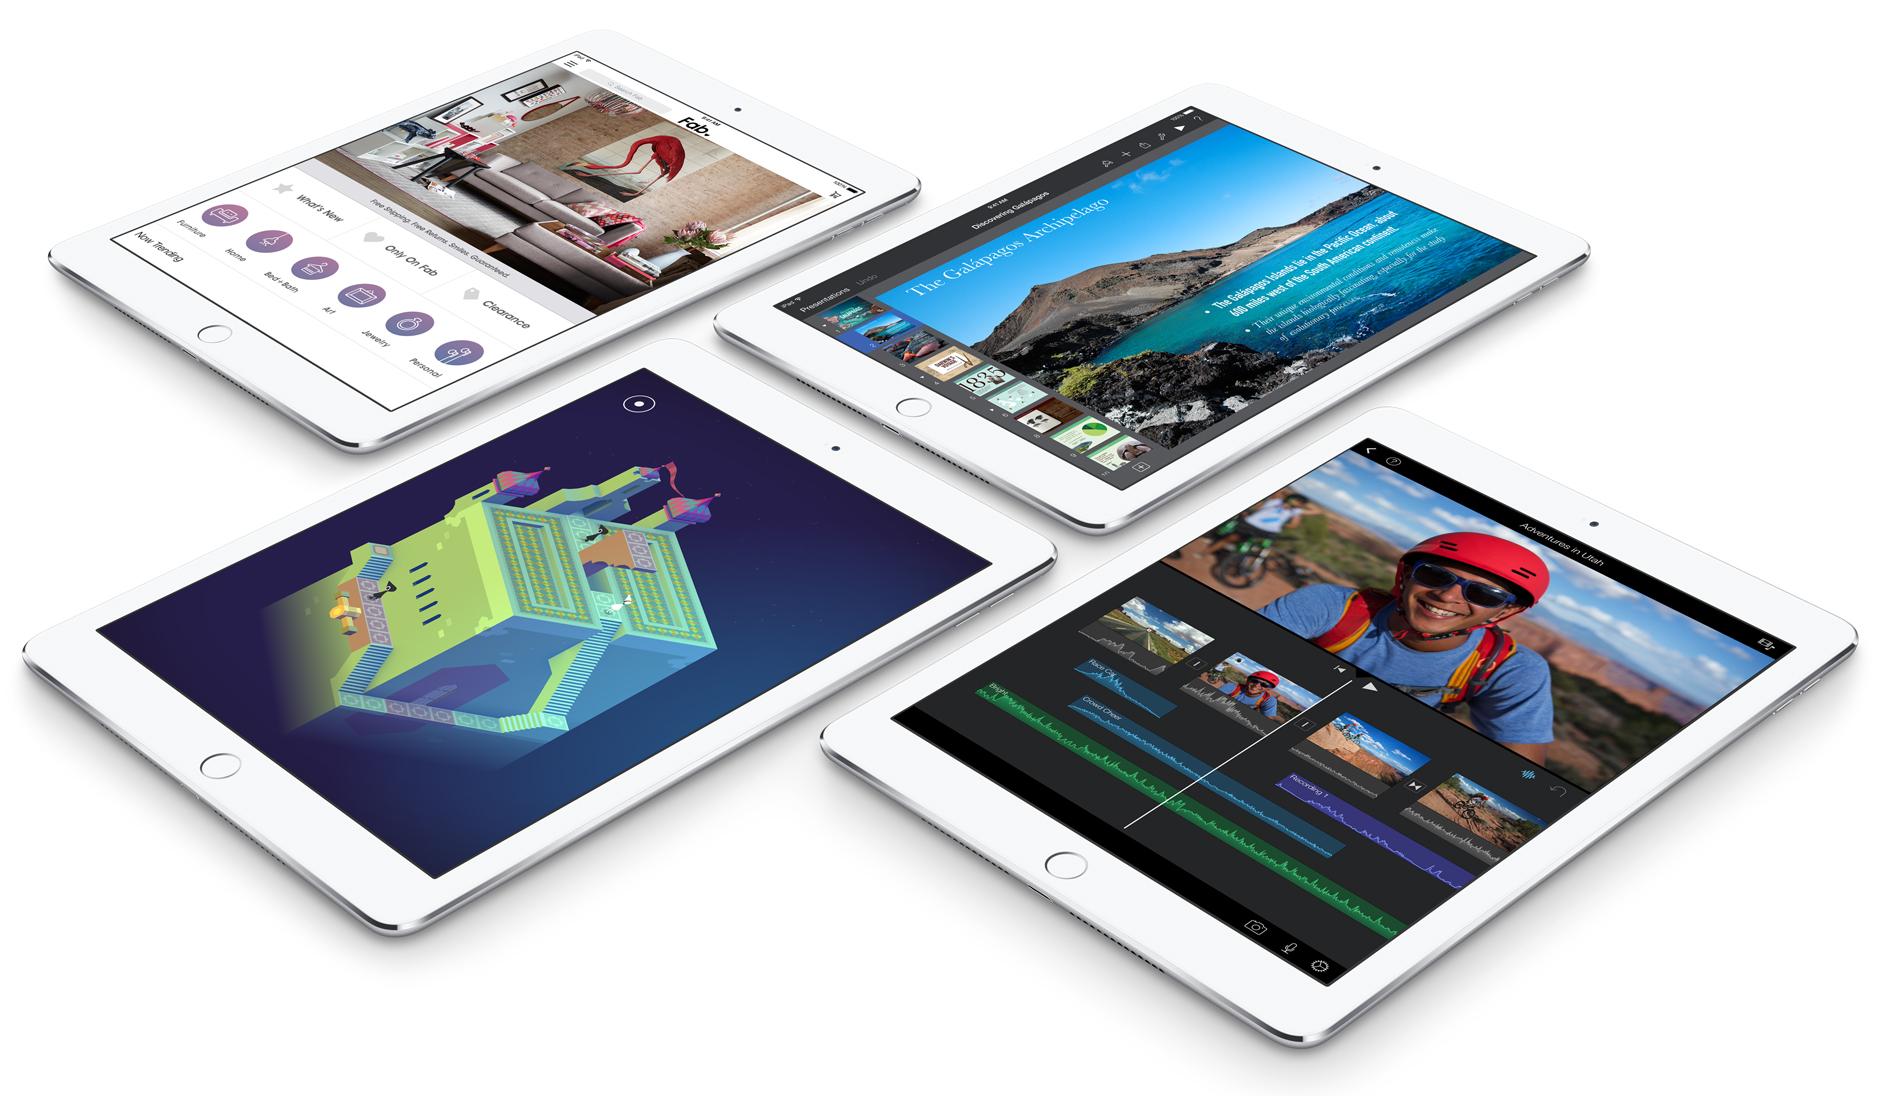 iPad Pro vs. iPad Air 2: Size